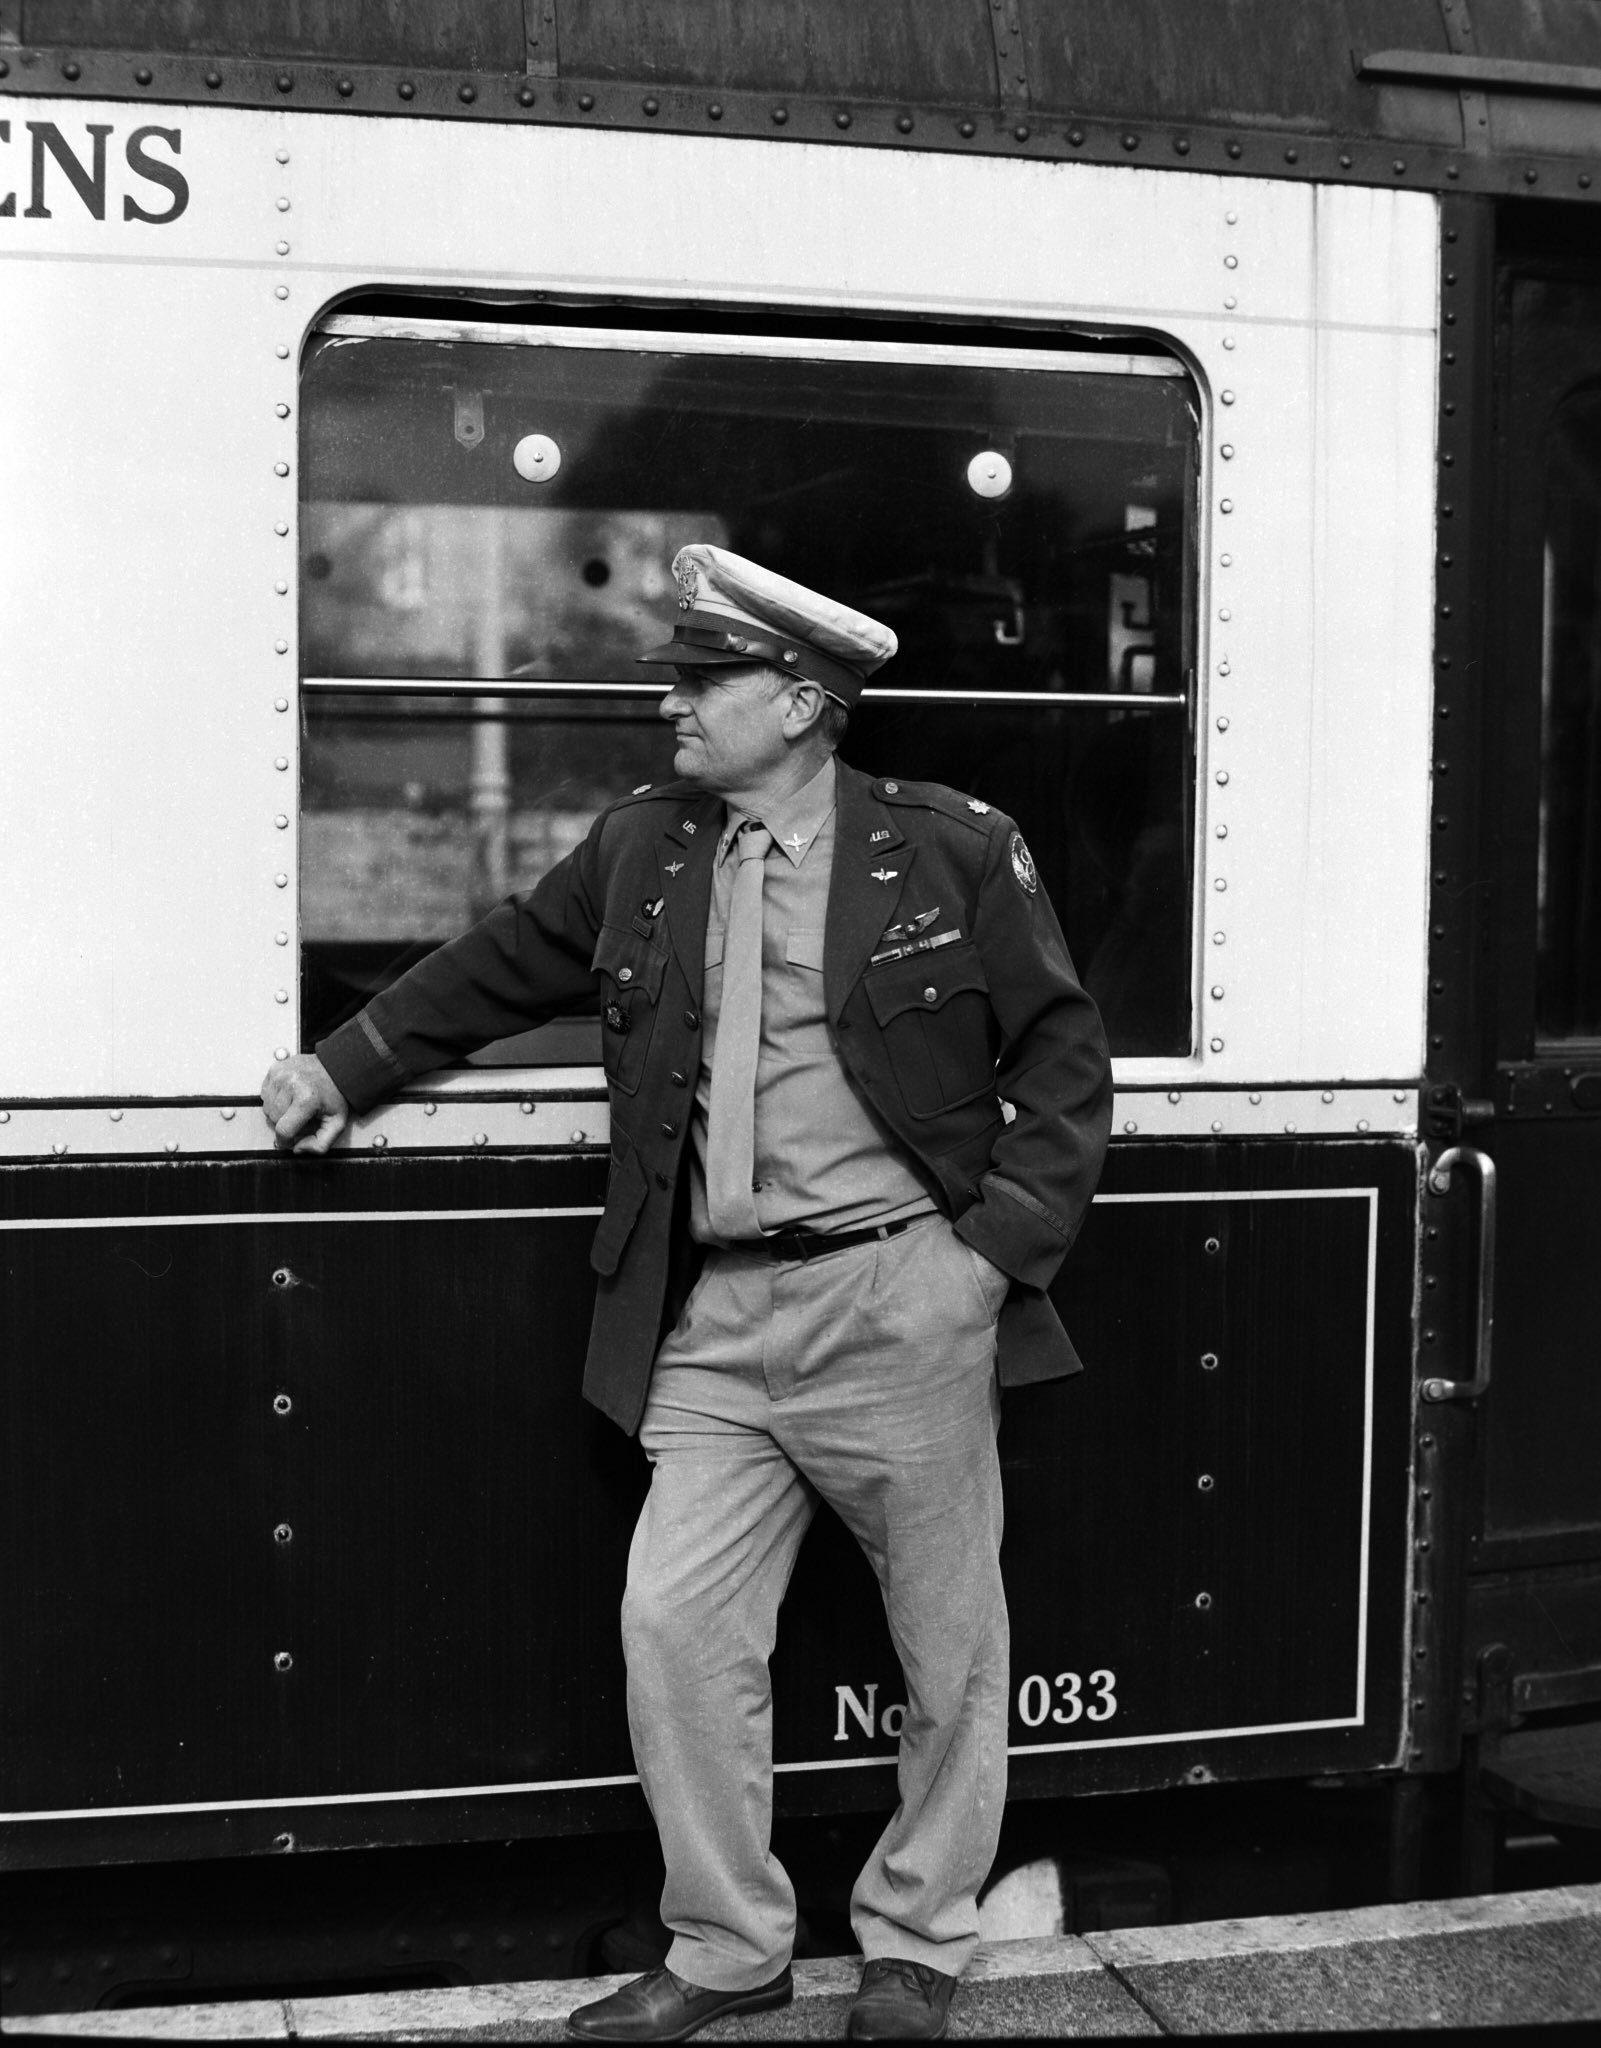 @fatmanjoe1 · 3h Replying to  @ILFORDPhoto Wartime at Wansford shot on FP4 on my Pentax 67 #ilfordphoto #fridayfavourites #6x7